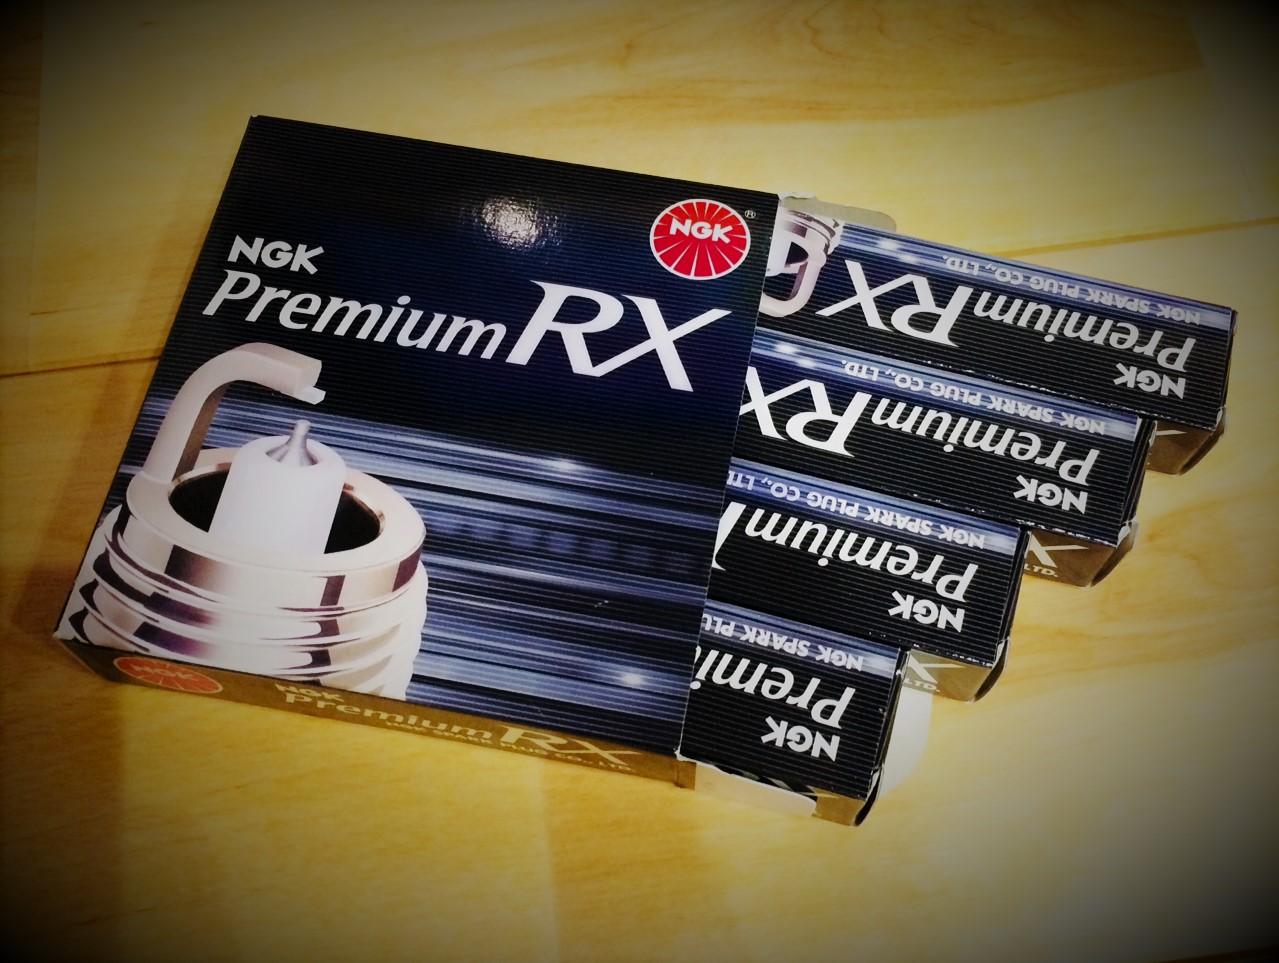 NGKスパークプラグ / 日本特殊陶業 Premium RX LKAR7ARX-11P